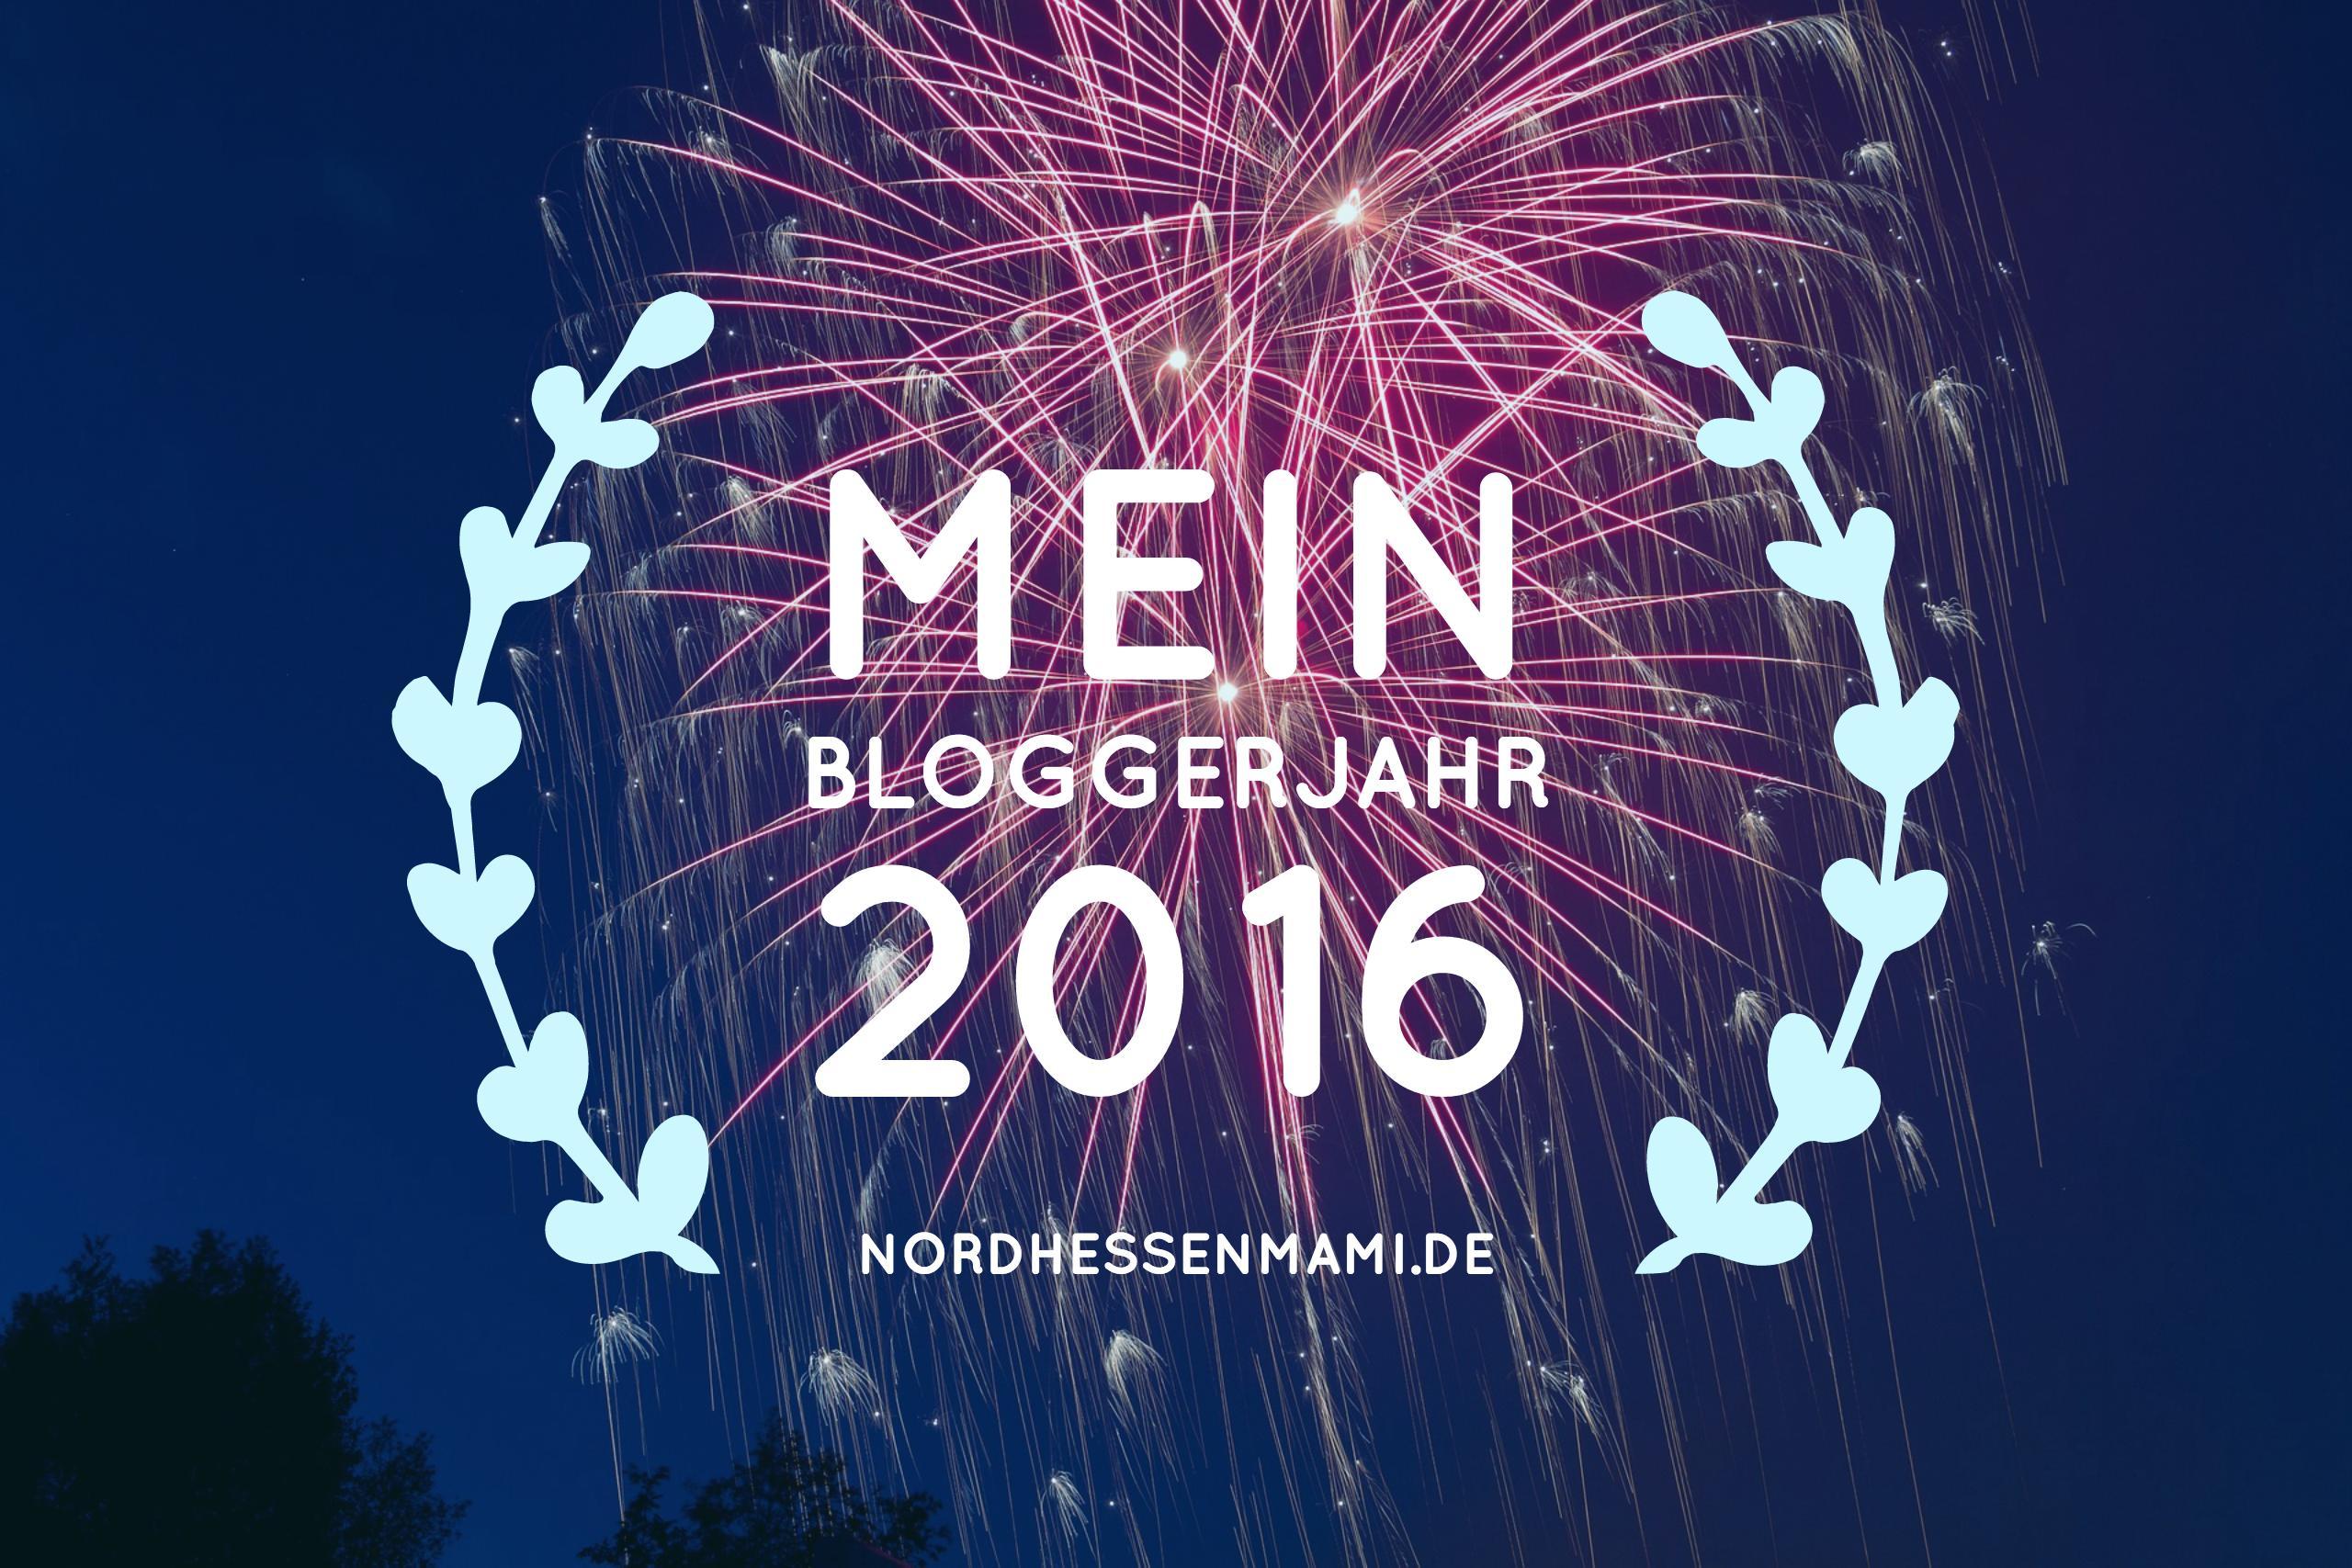 MeinBloggerjahr2016